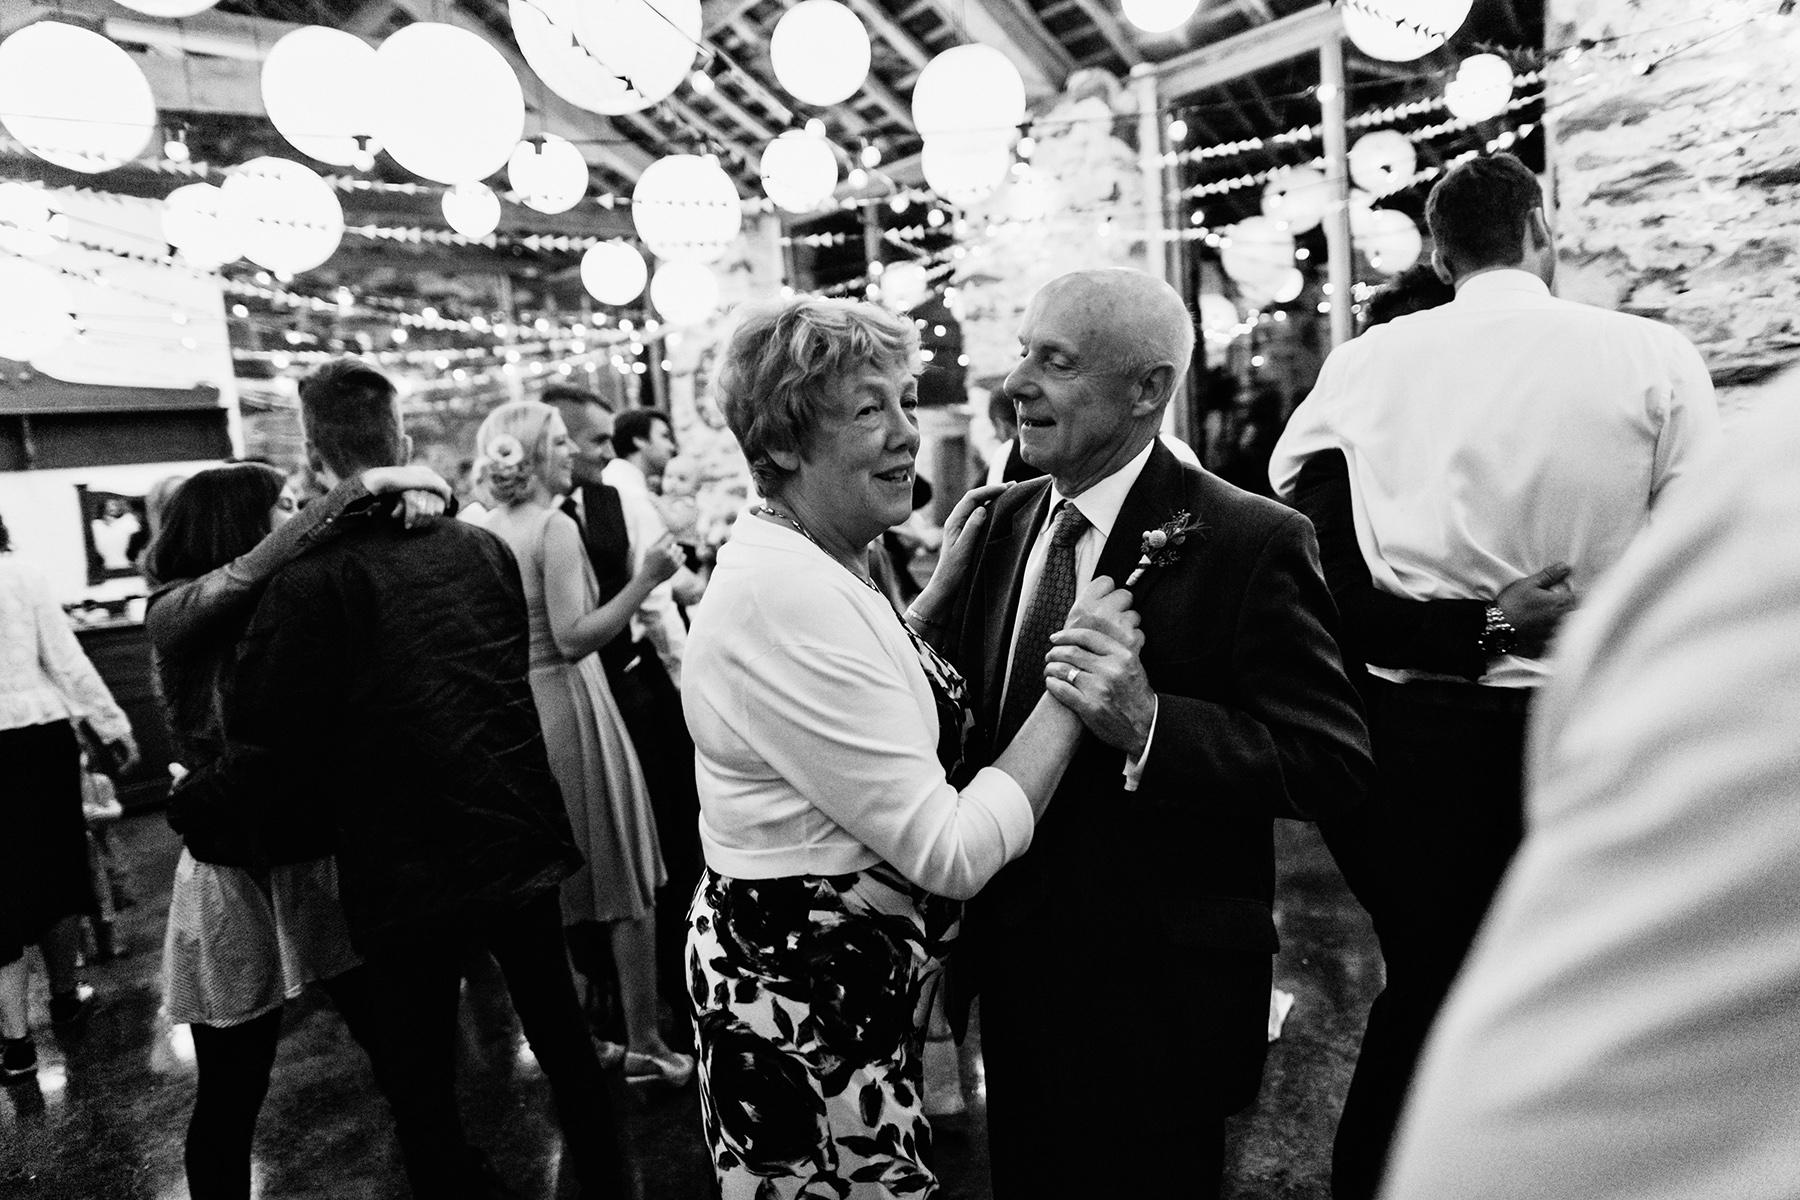 Snowdonia-Wales-Wedding-Photos-0406.jpg